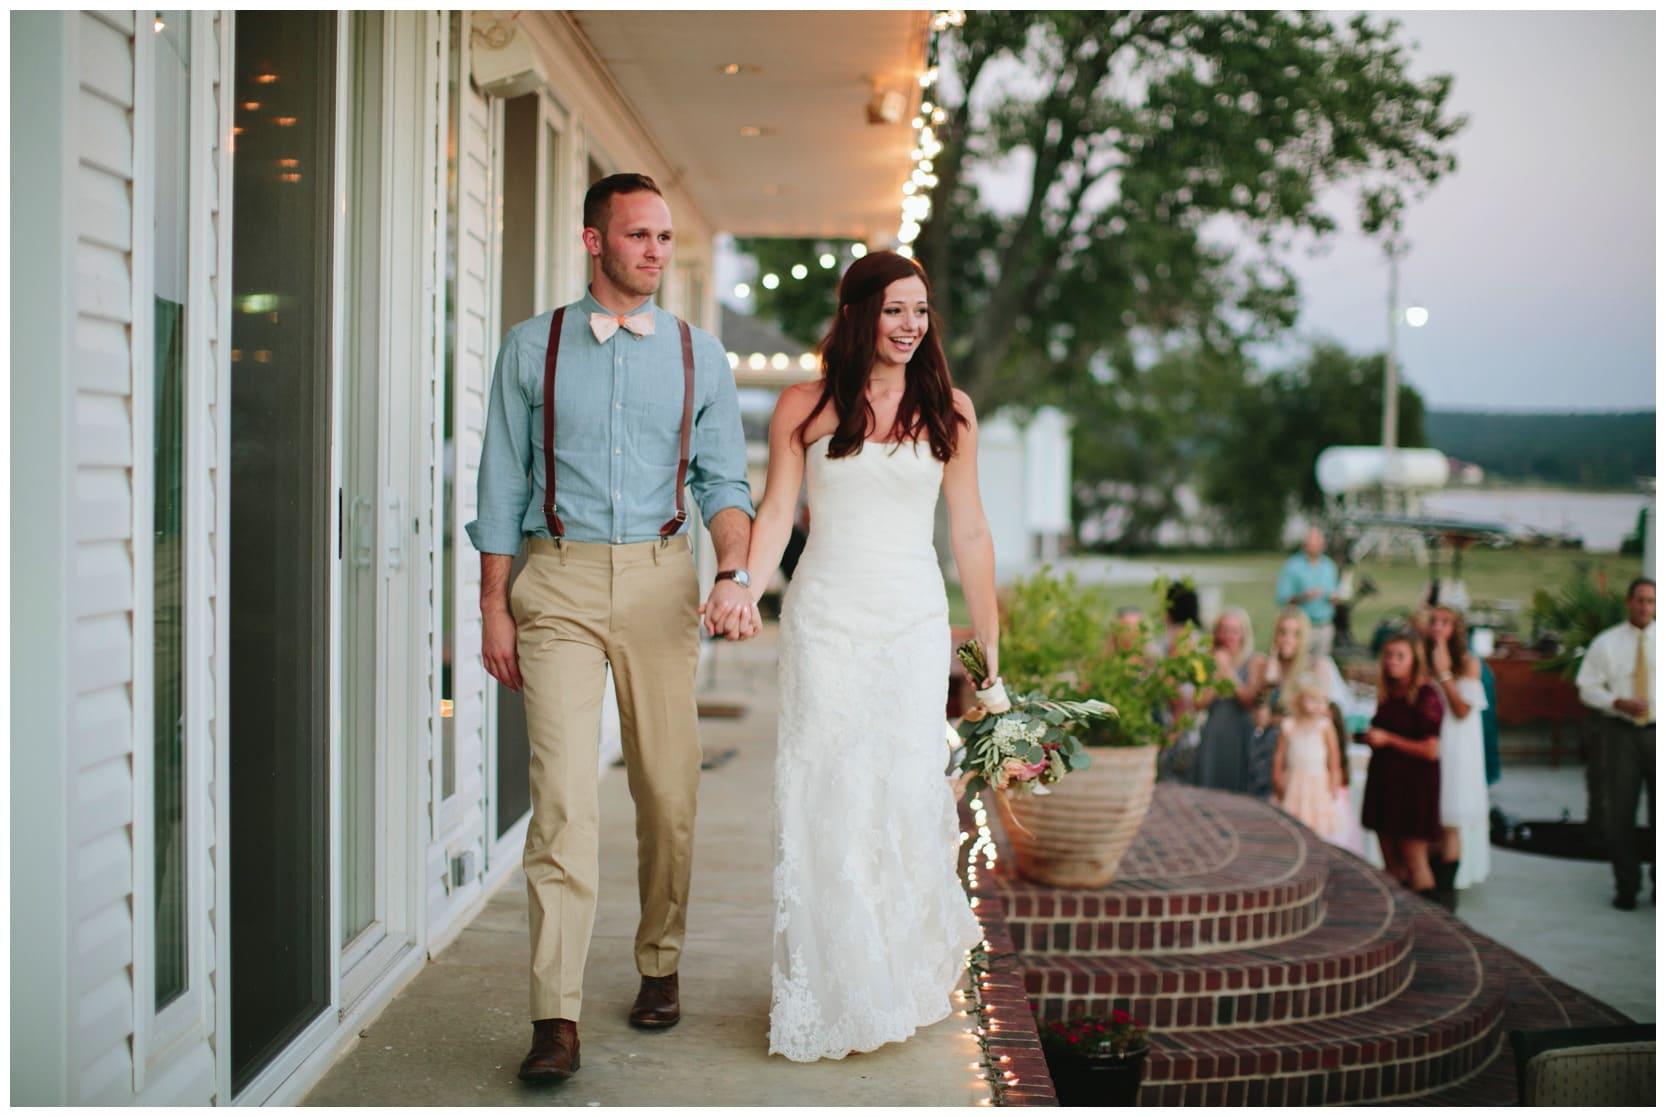 sauserkirby_wedding__15